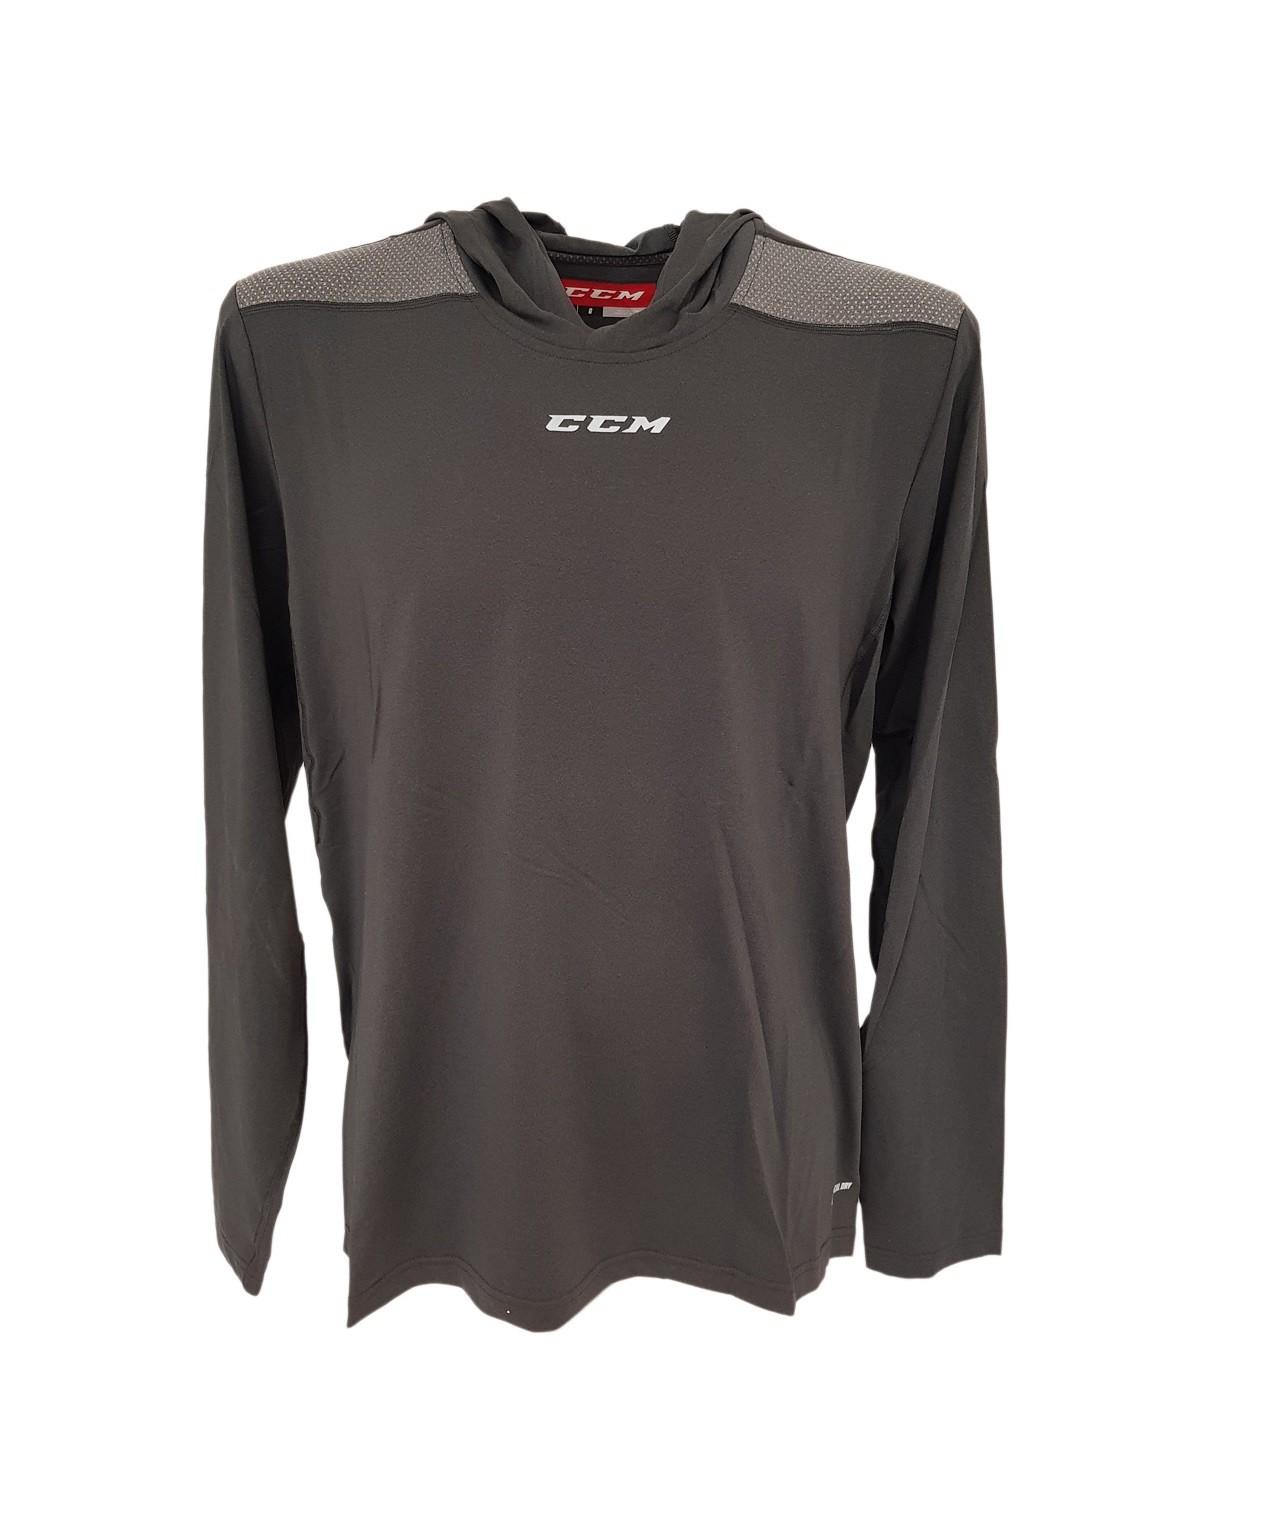 CCM Dynamic Ls Hooded Tee Adult Sweatshirt